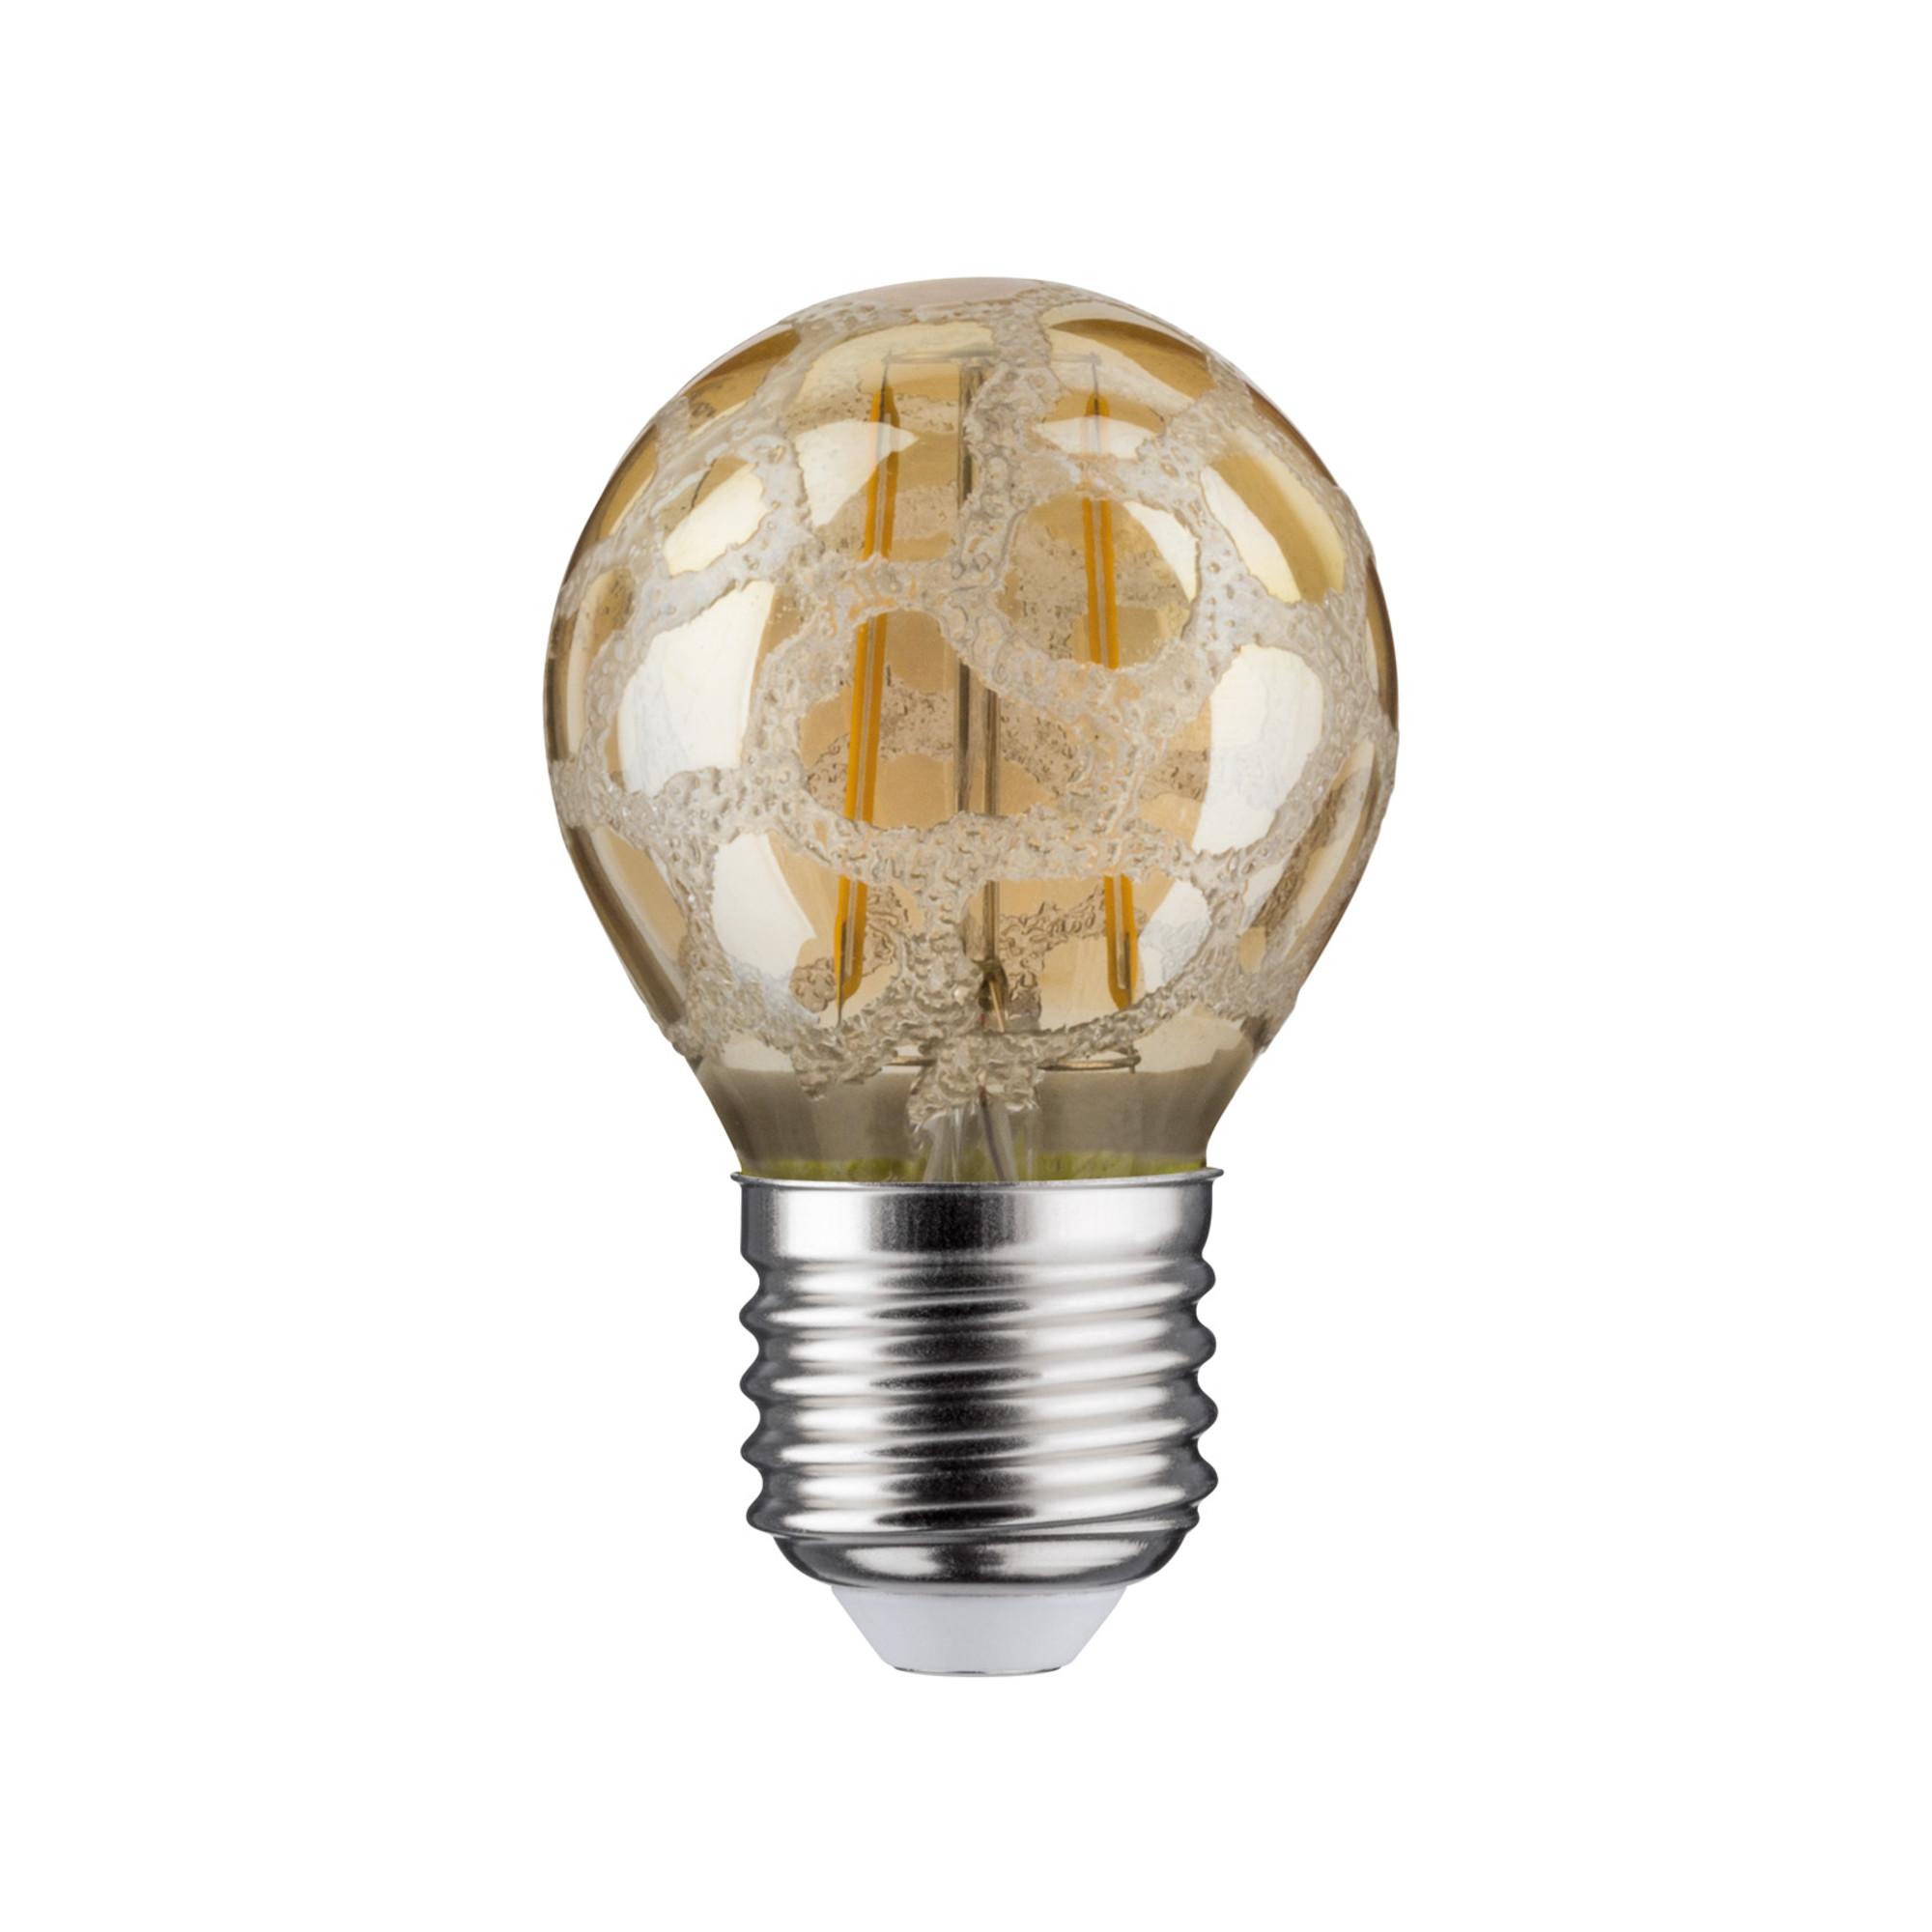 Лампа филаментная Paulmann Капля 2.5Вт 200лм 2500К Е27 230В Золото Кроколед 28383.